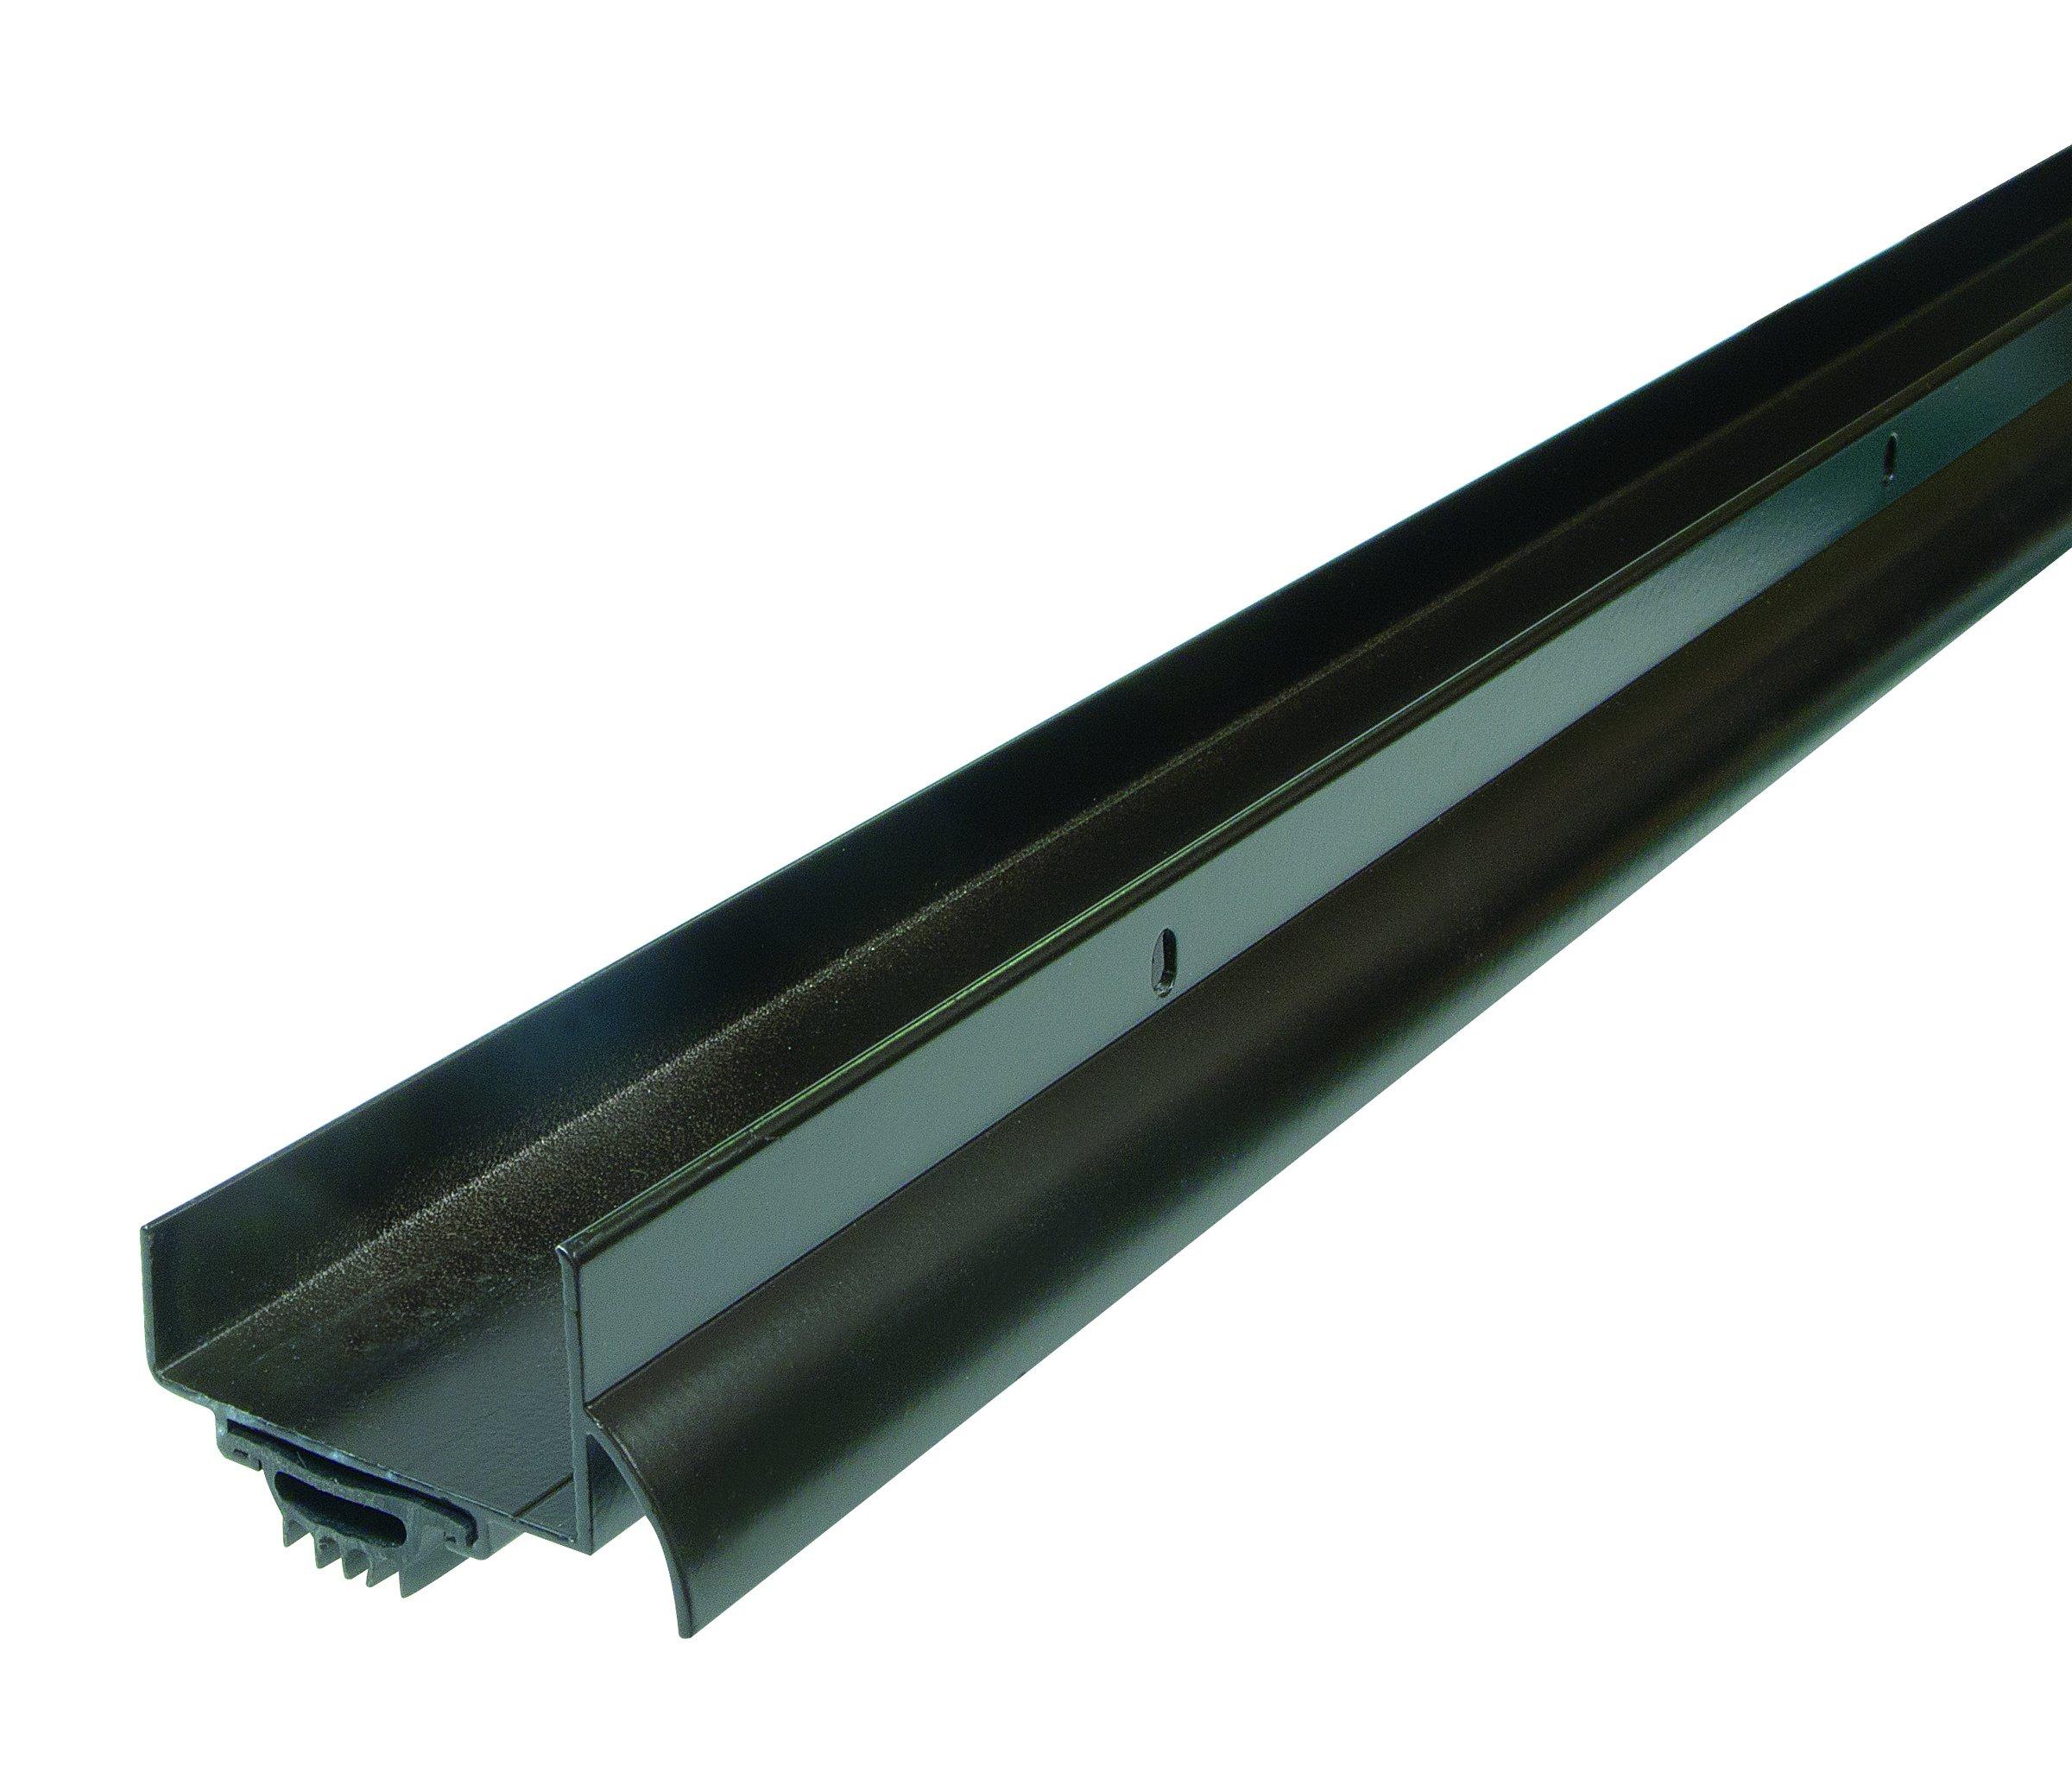 WJ Dennis & Company 742B Premium U-Shaped Aluminum with Drip Cap Door Bottom, 2 1/4-Inch x 1 1/2-Inch x 36-Inch, U-Shaped, Brown